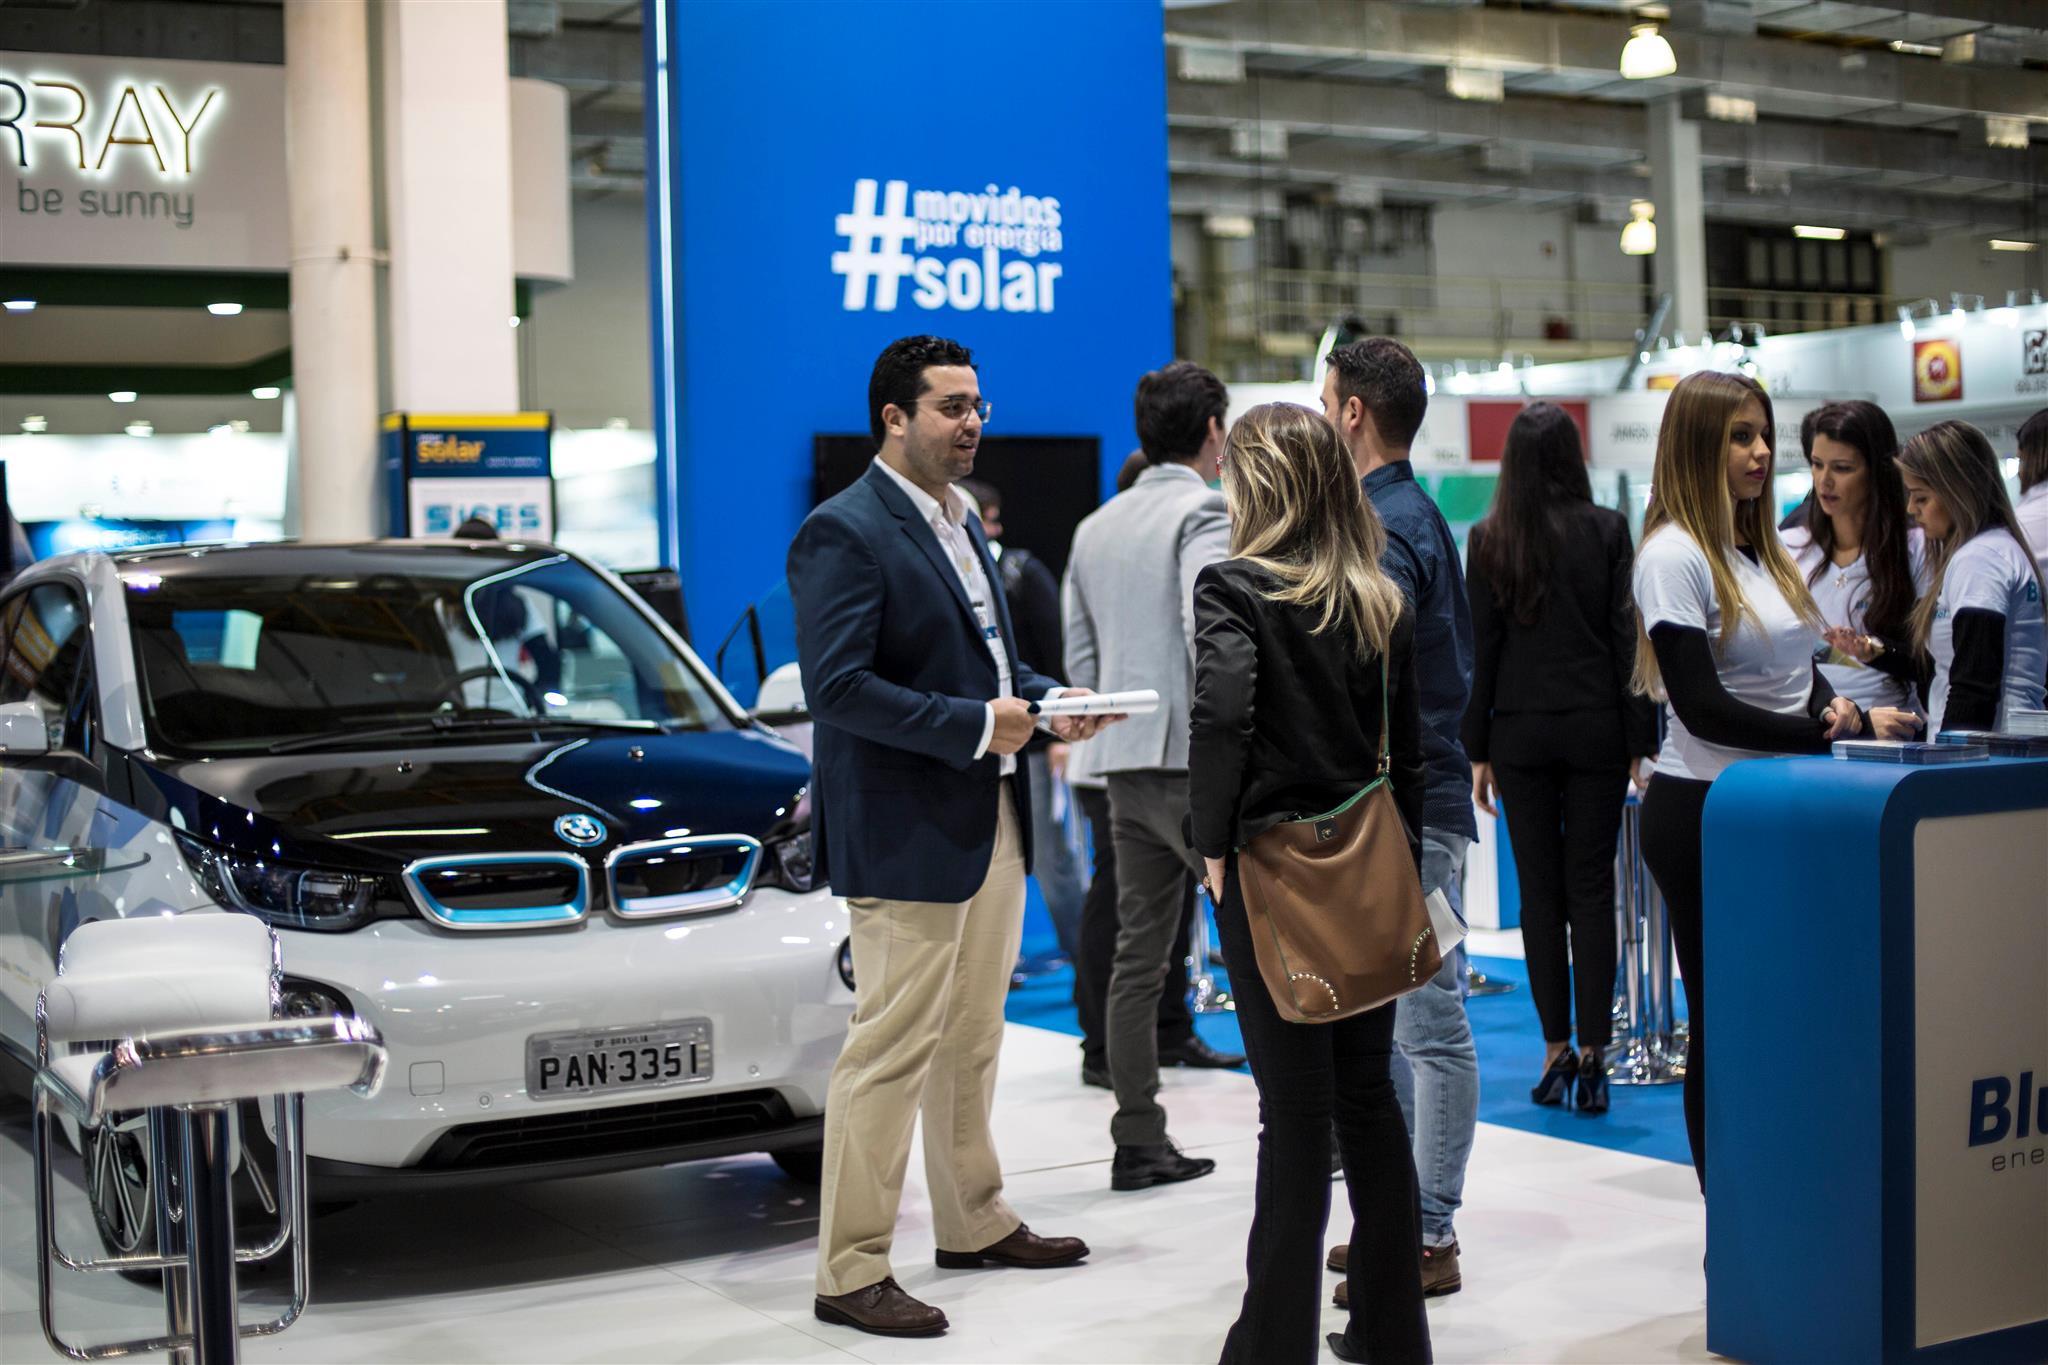 Blue Sol na feira de energia solar Intersolar (3)